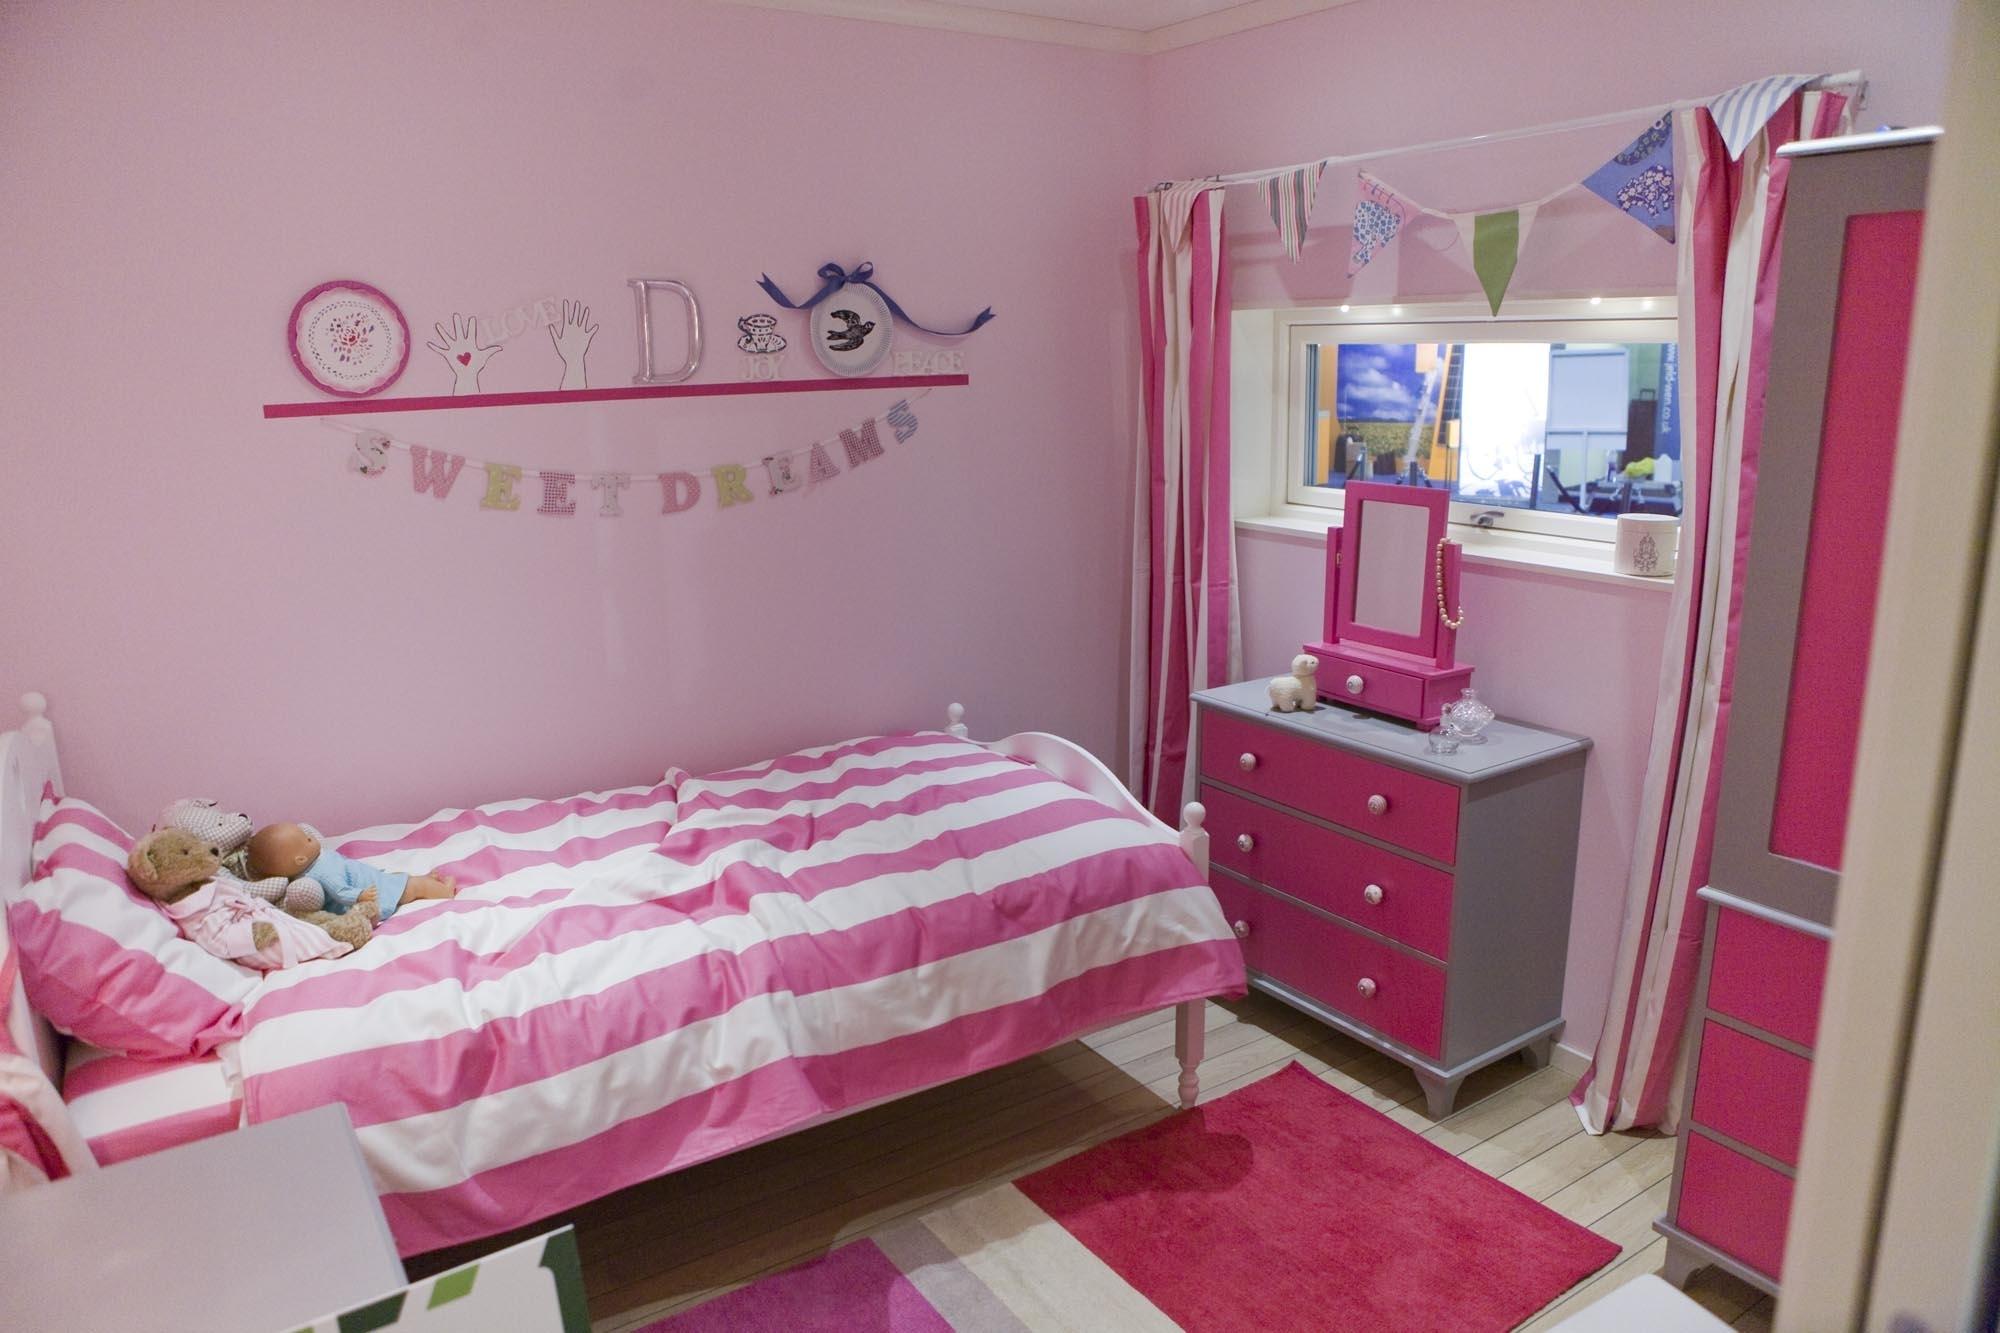 girls bedroom pictures photo - 1